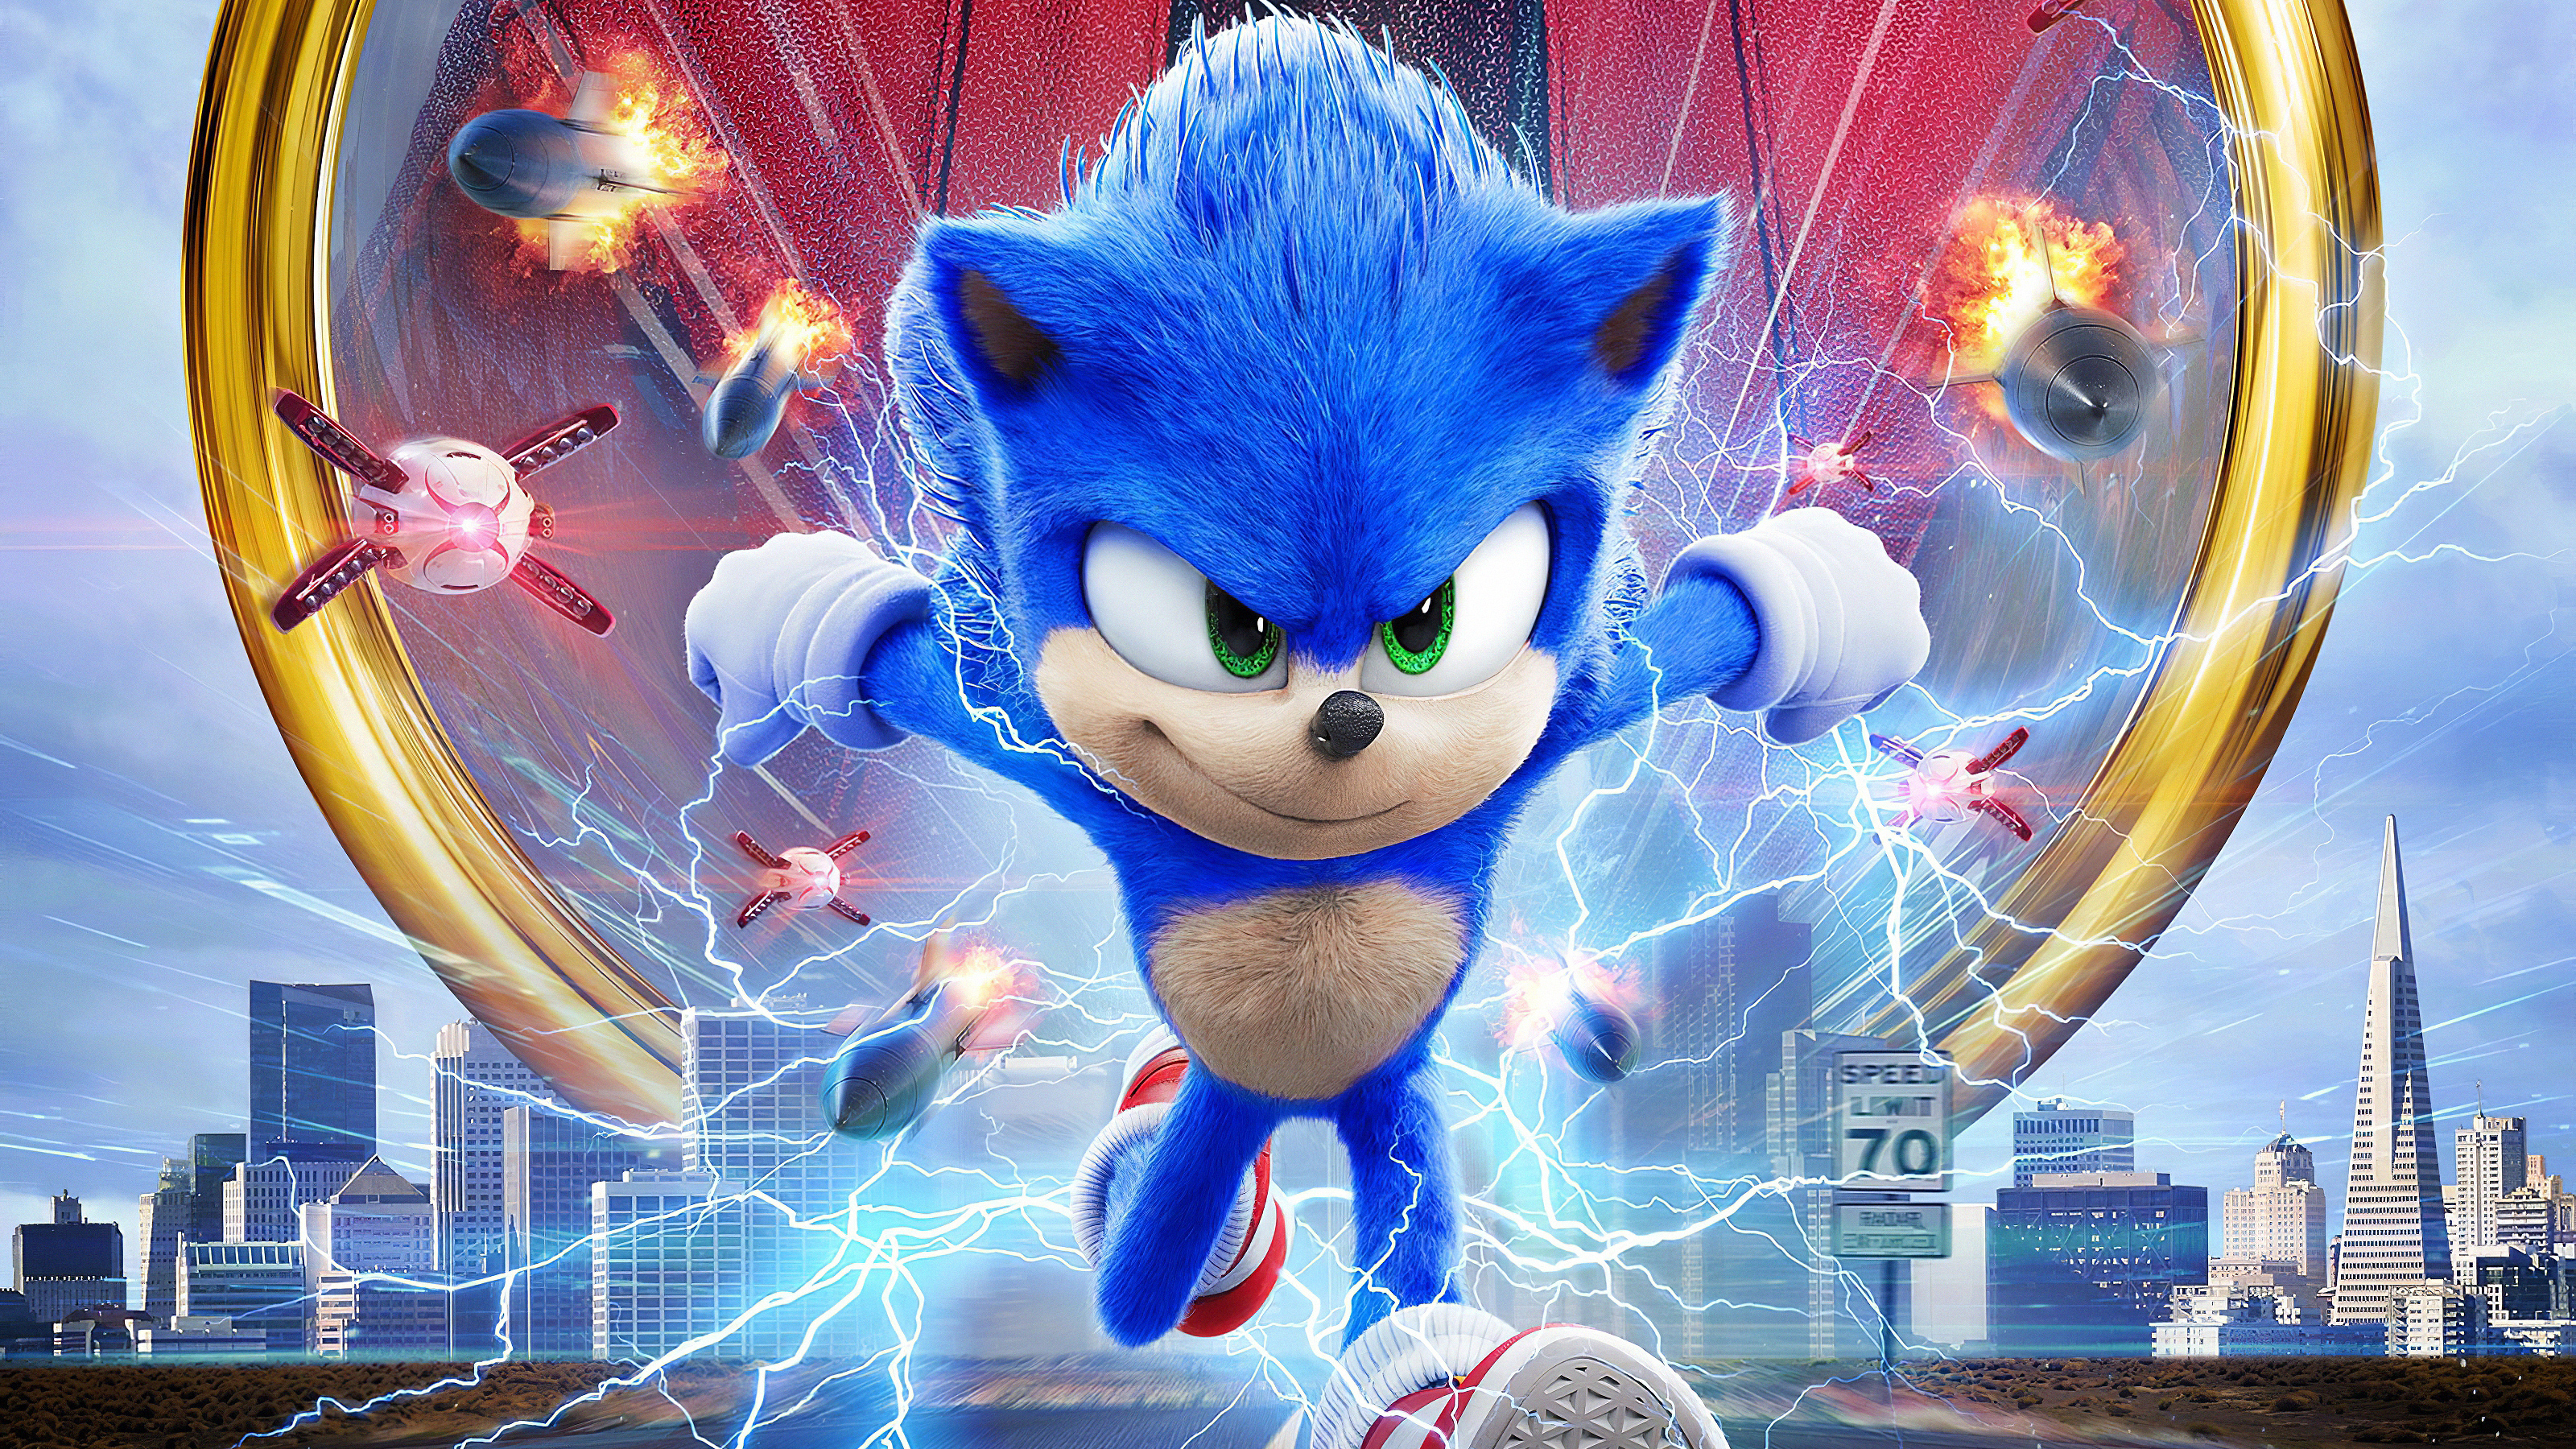 Sonic The Hedgehog 2020 Movie Hd Movies 4k Wallpapers